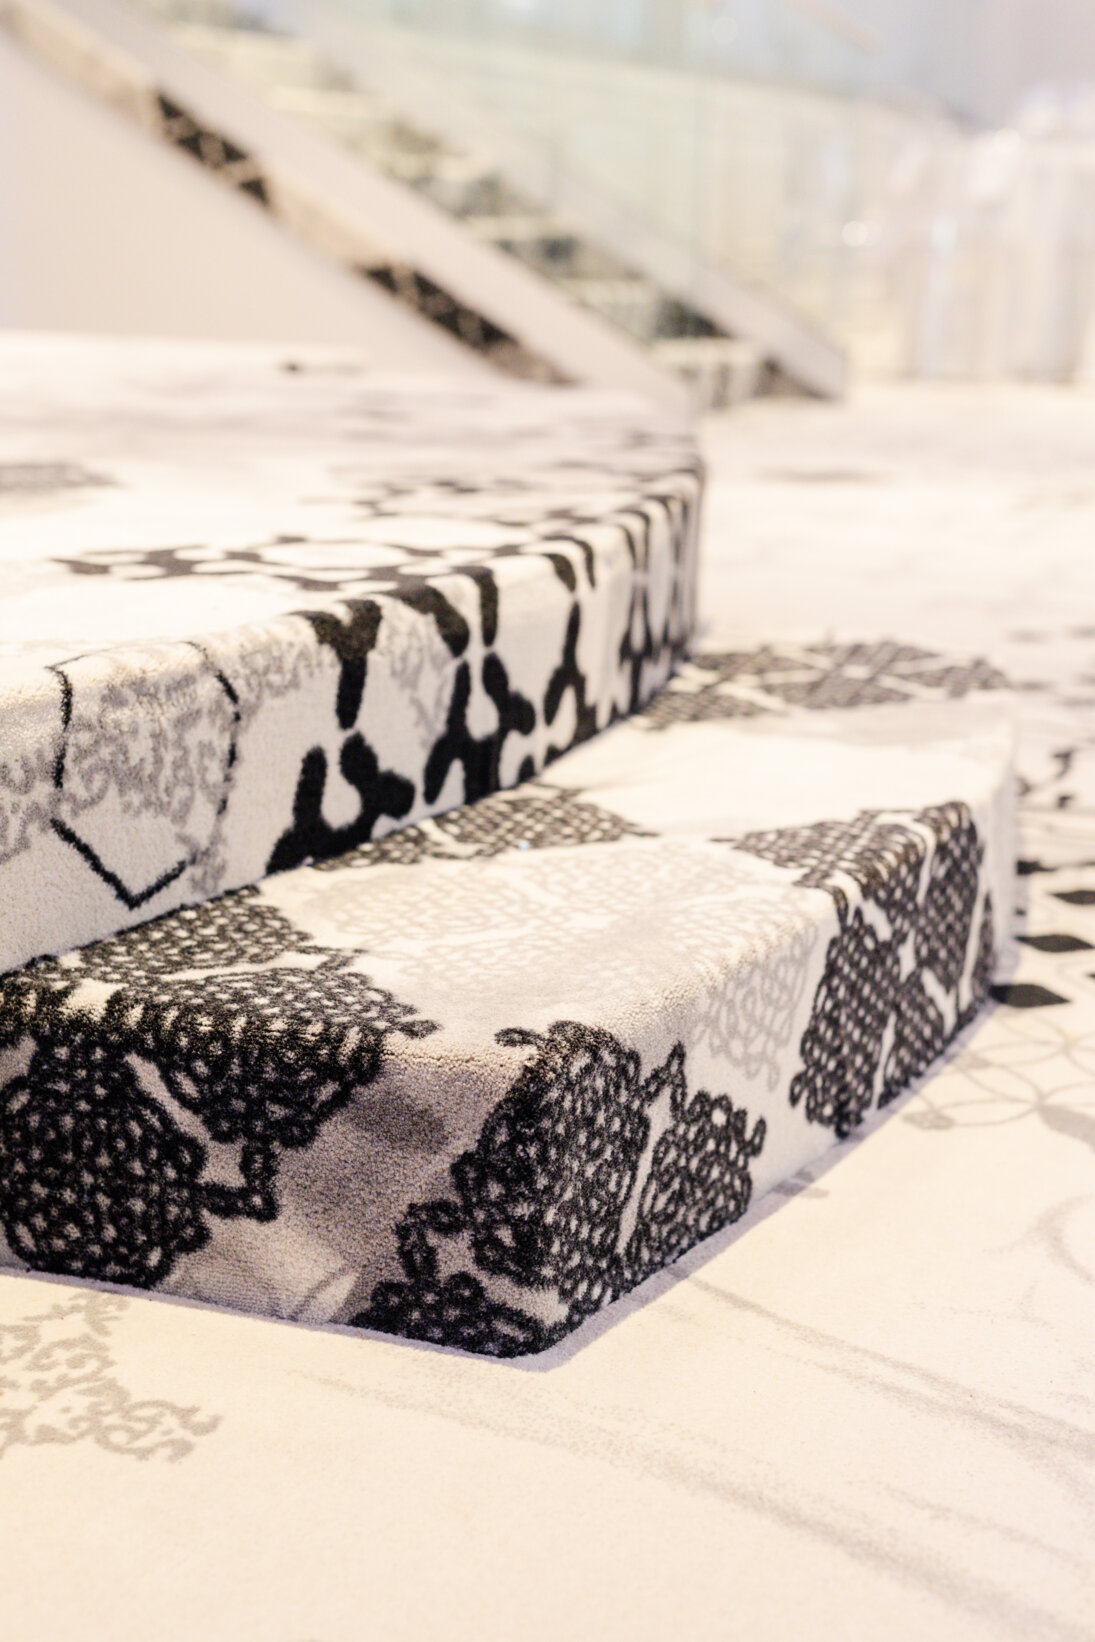 20210303-carpet&more-hotel-rocca-craiovaby-hugmedia-30